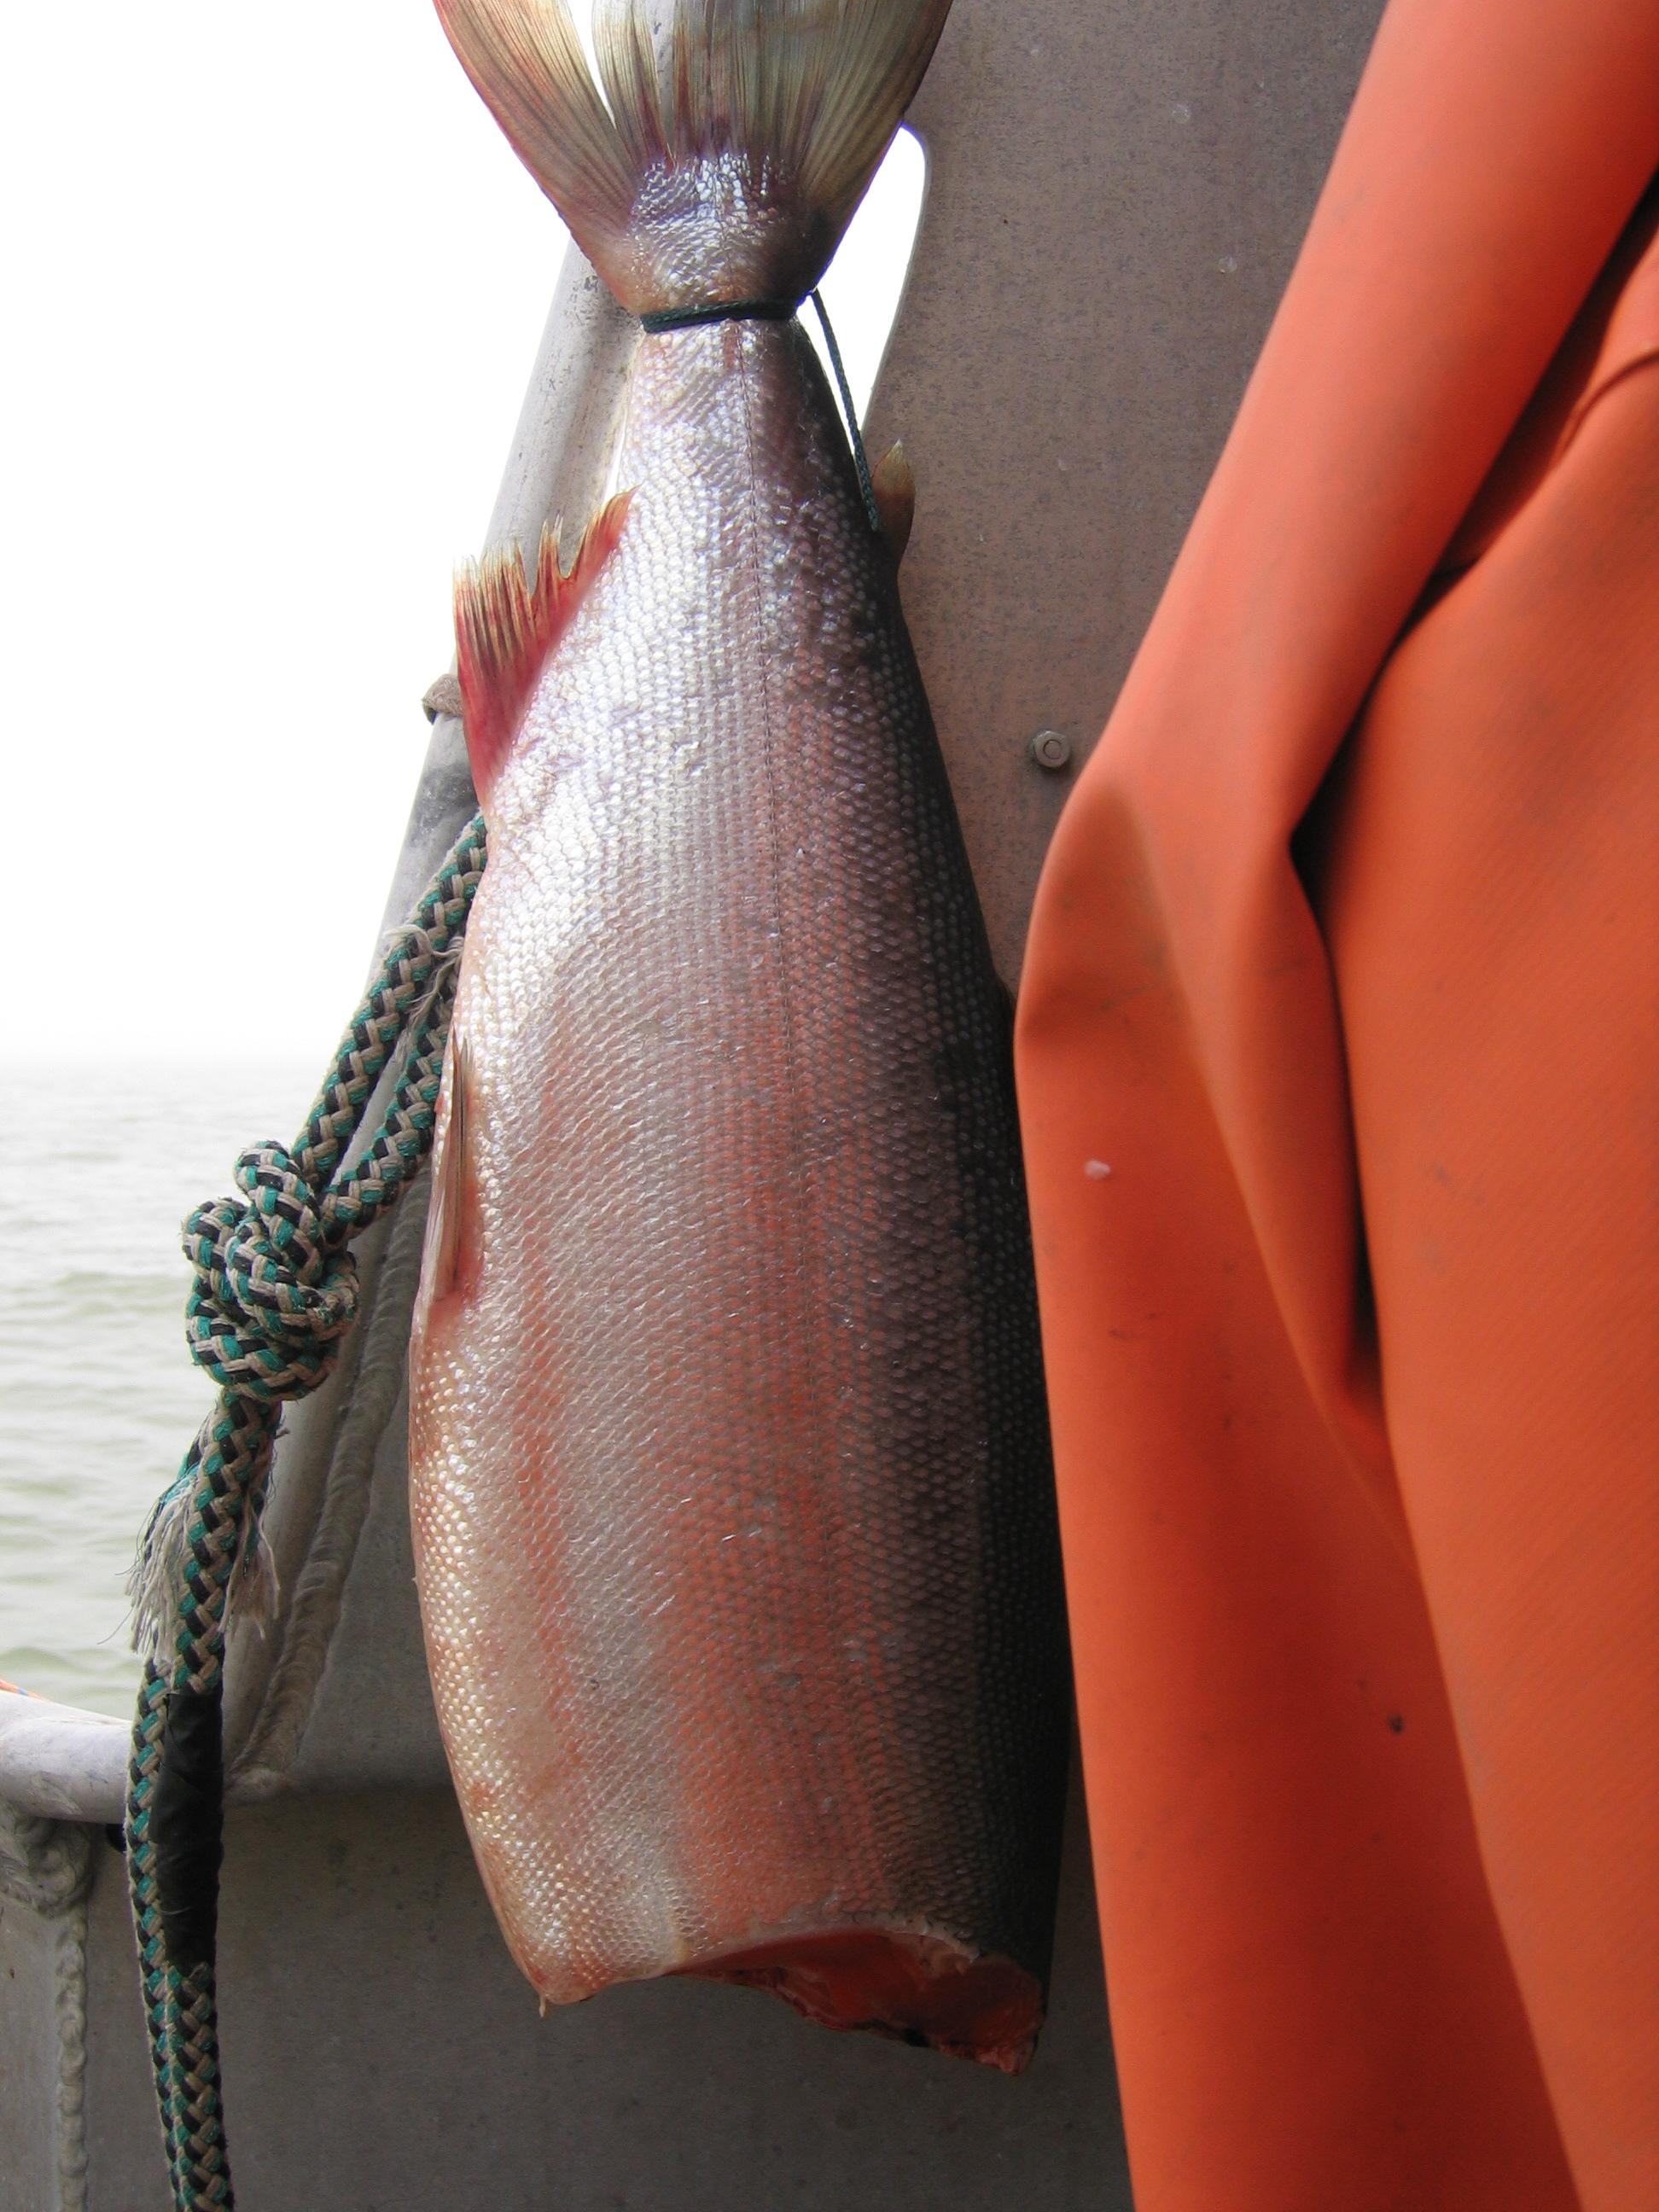 Hanging a fish